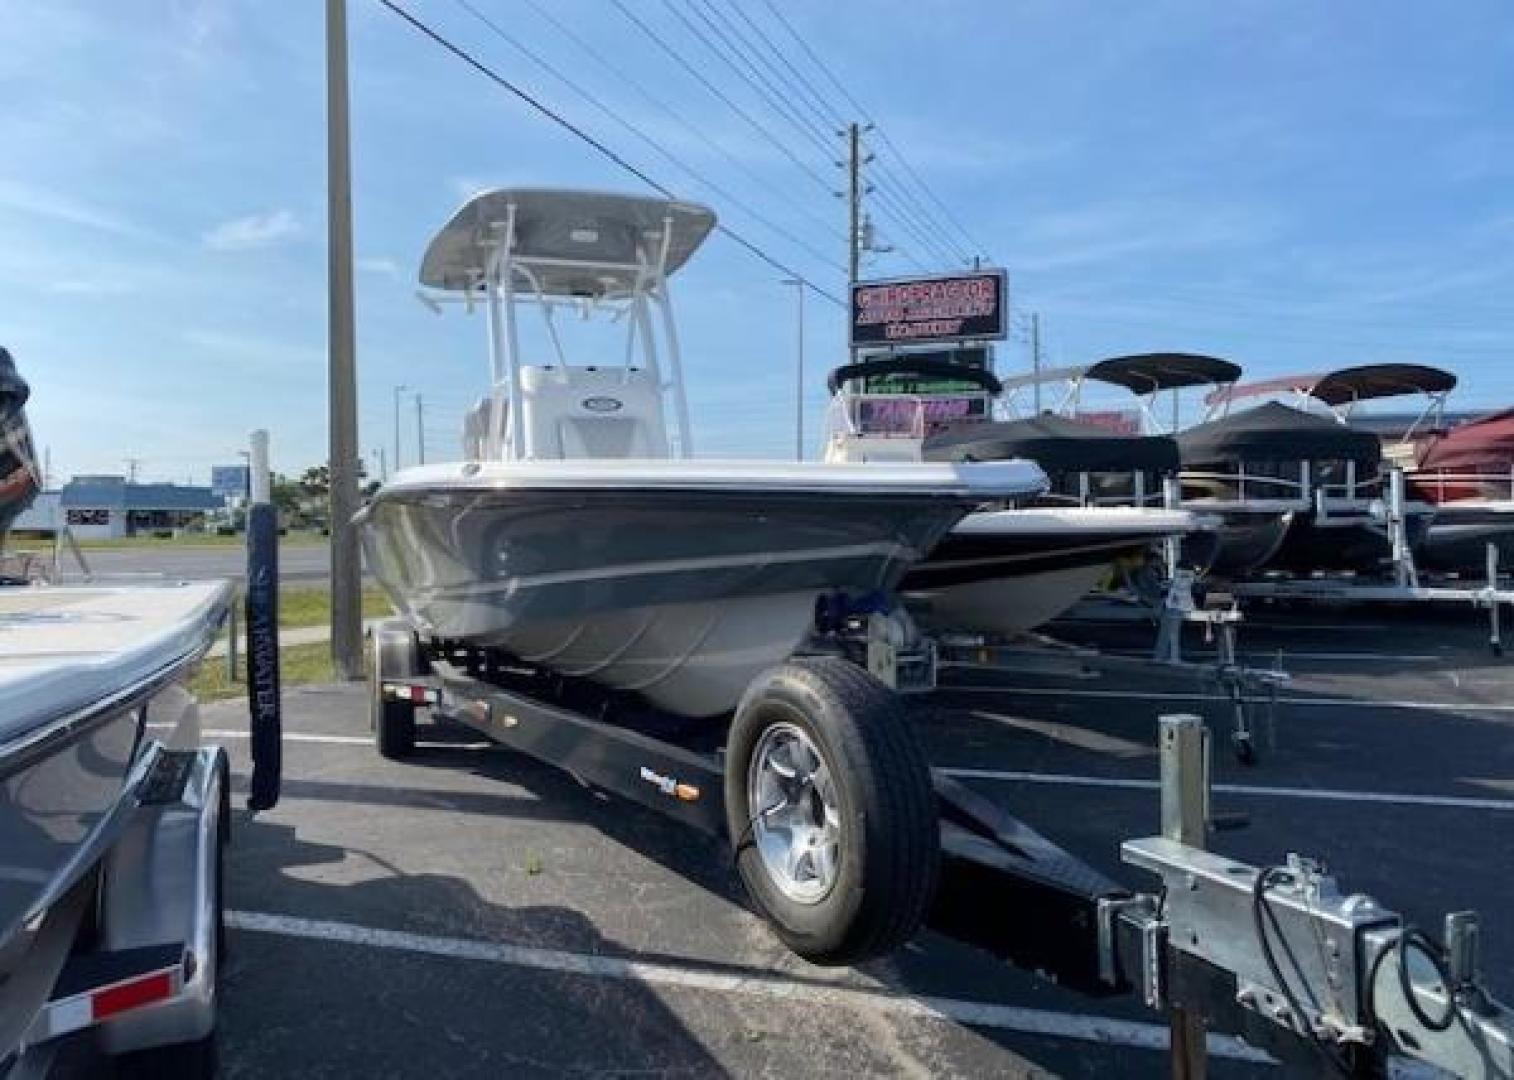 Epic-26 Bay 2019-Epic 26 Bay Tampa Bay-Florida-United States-1526357 | Thumbnail